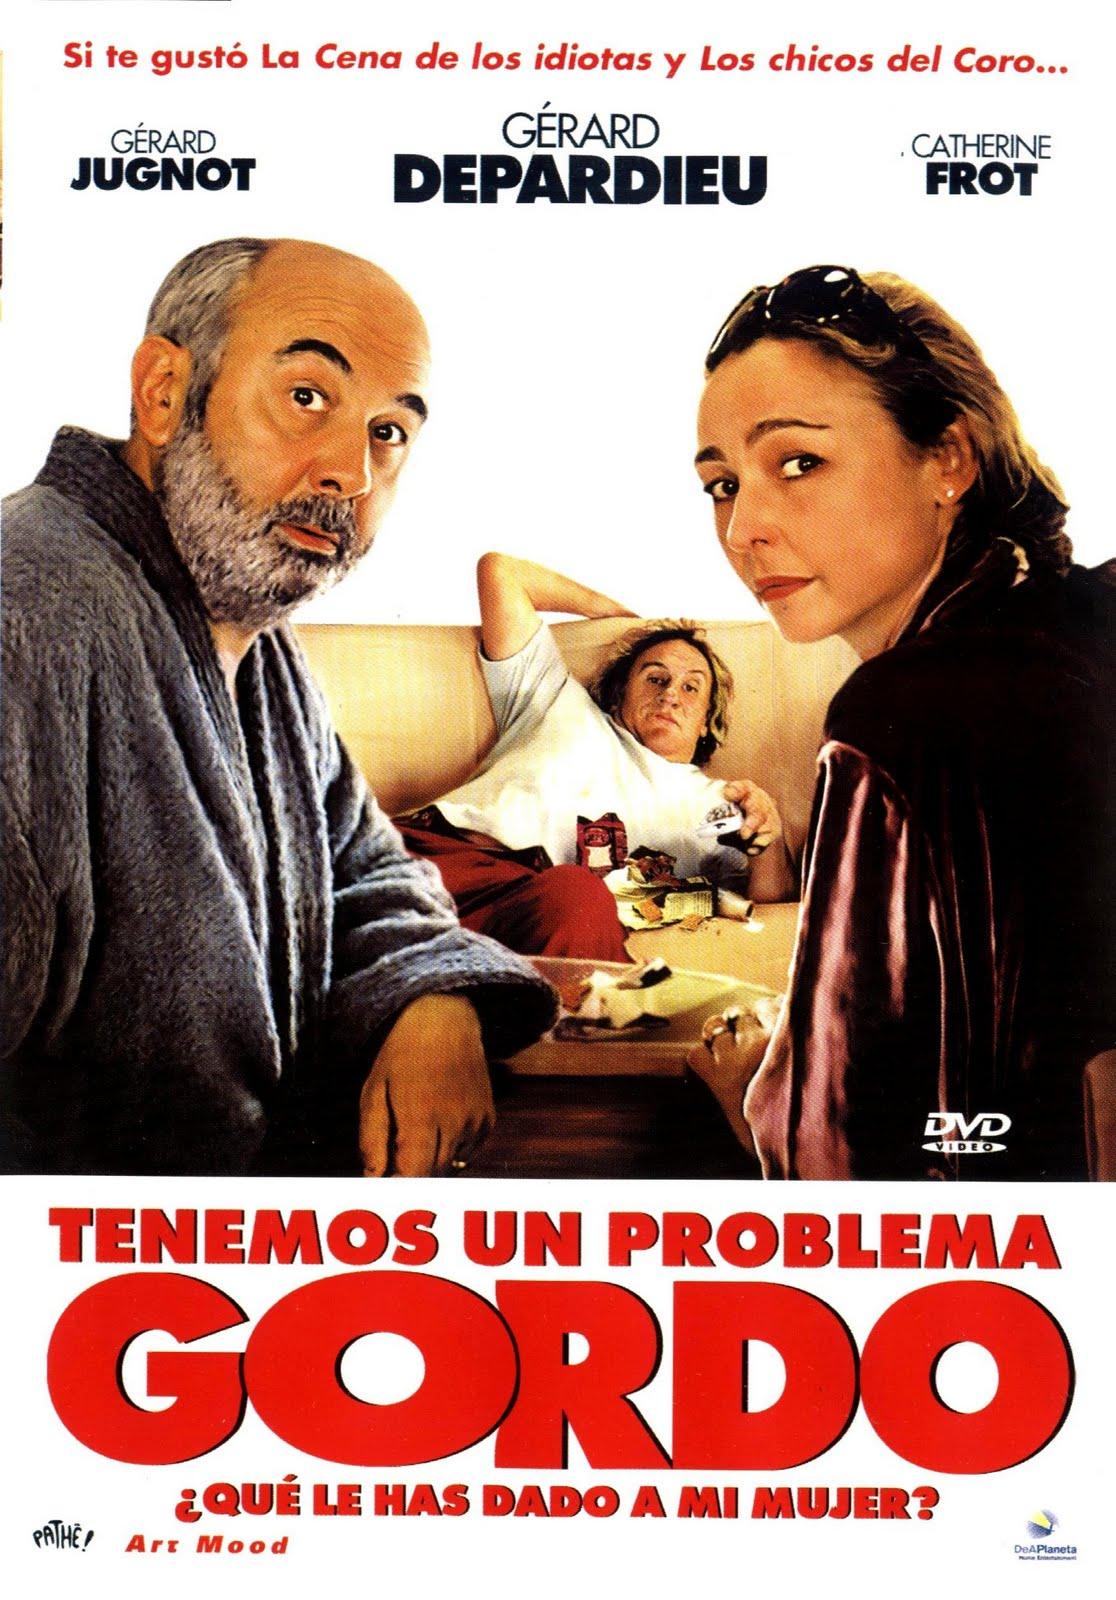 Tenemos un problema gordo (2005)